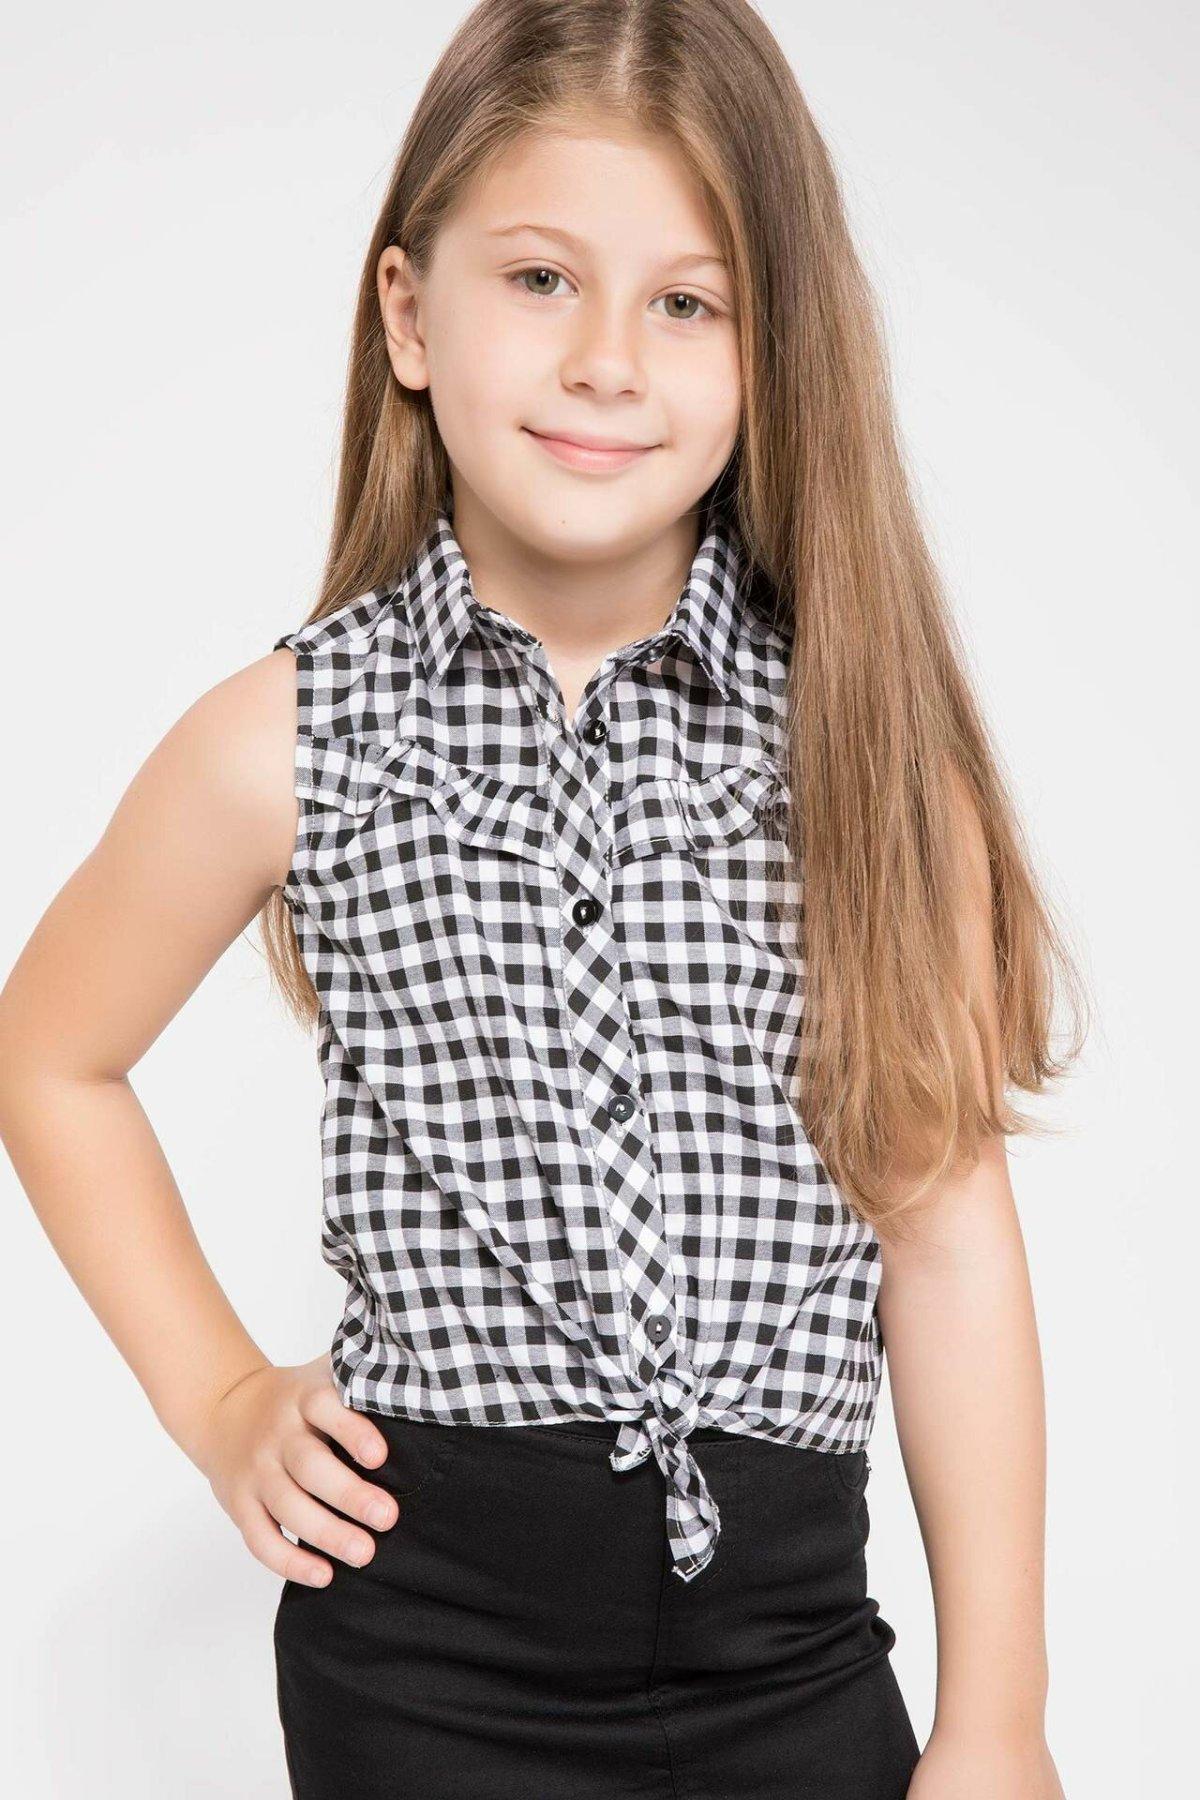 DeFacto Sleeveless White Black Plaid Girl Shirts Classical Woven Ball Kids Turn-down Colar Bowtie Shirt K2105A618HSBK46-K2105A618HS